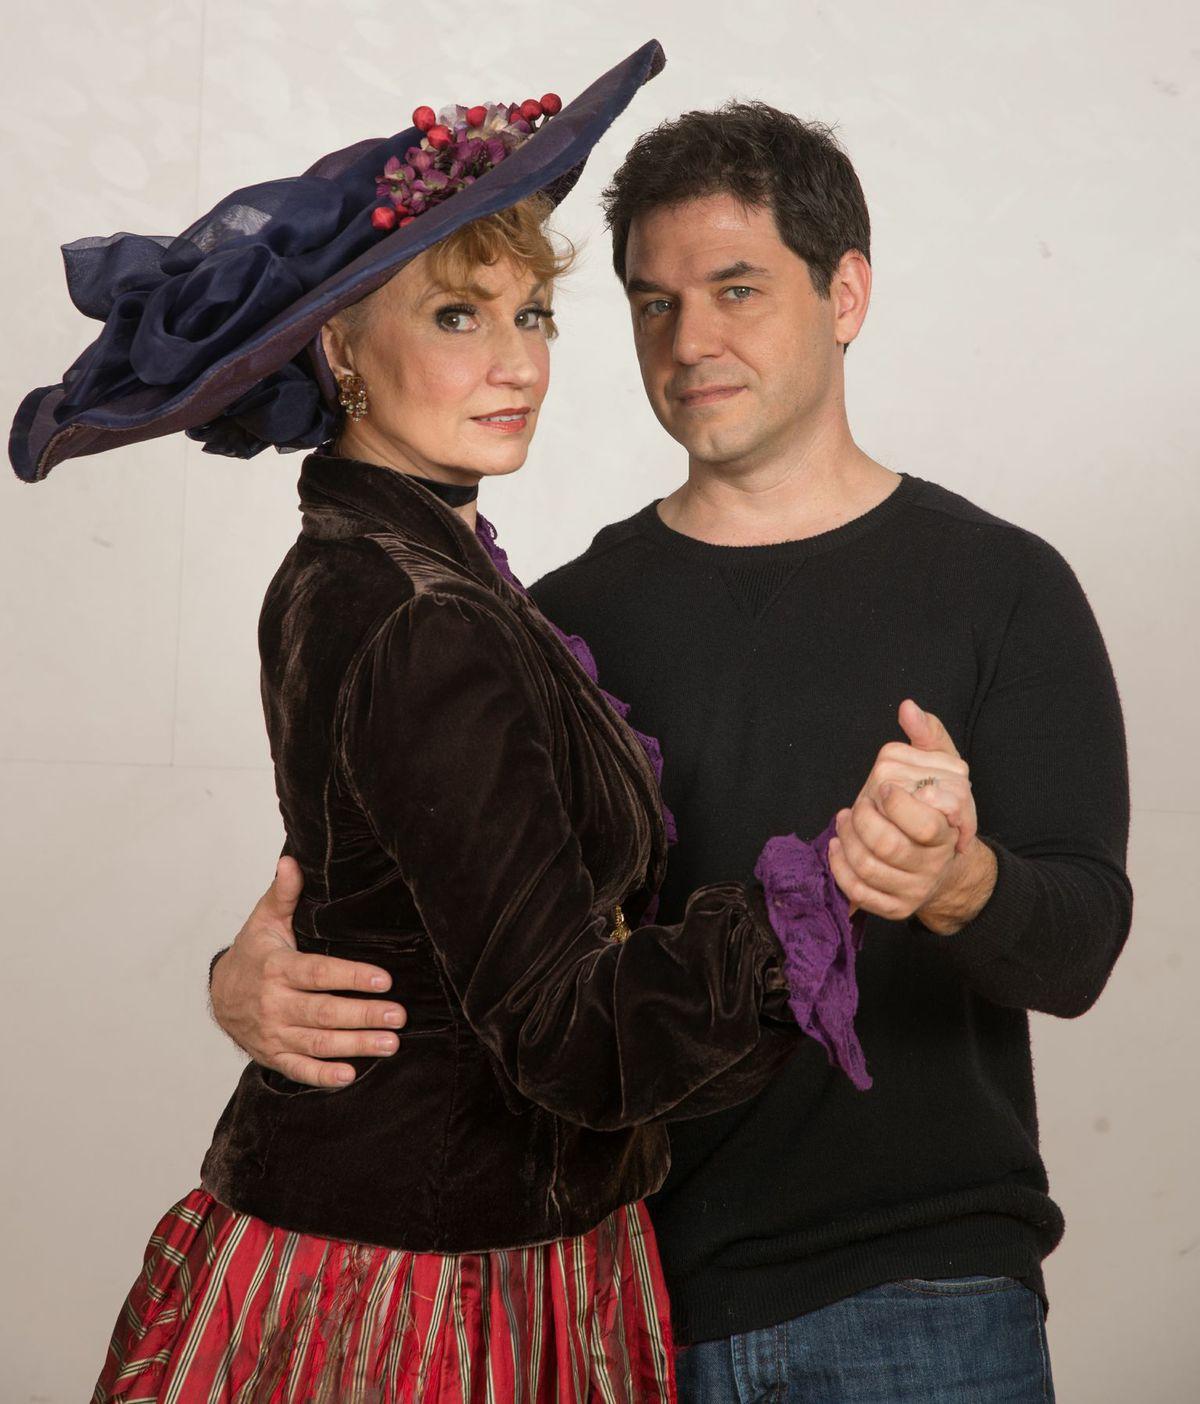 Krissy Richmond and John Grimeon as Anna and Matt